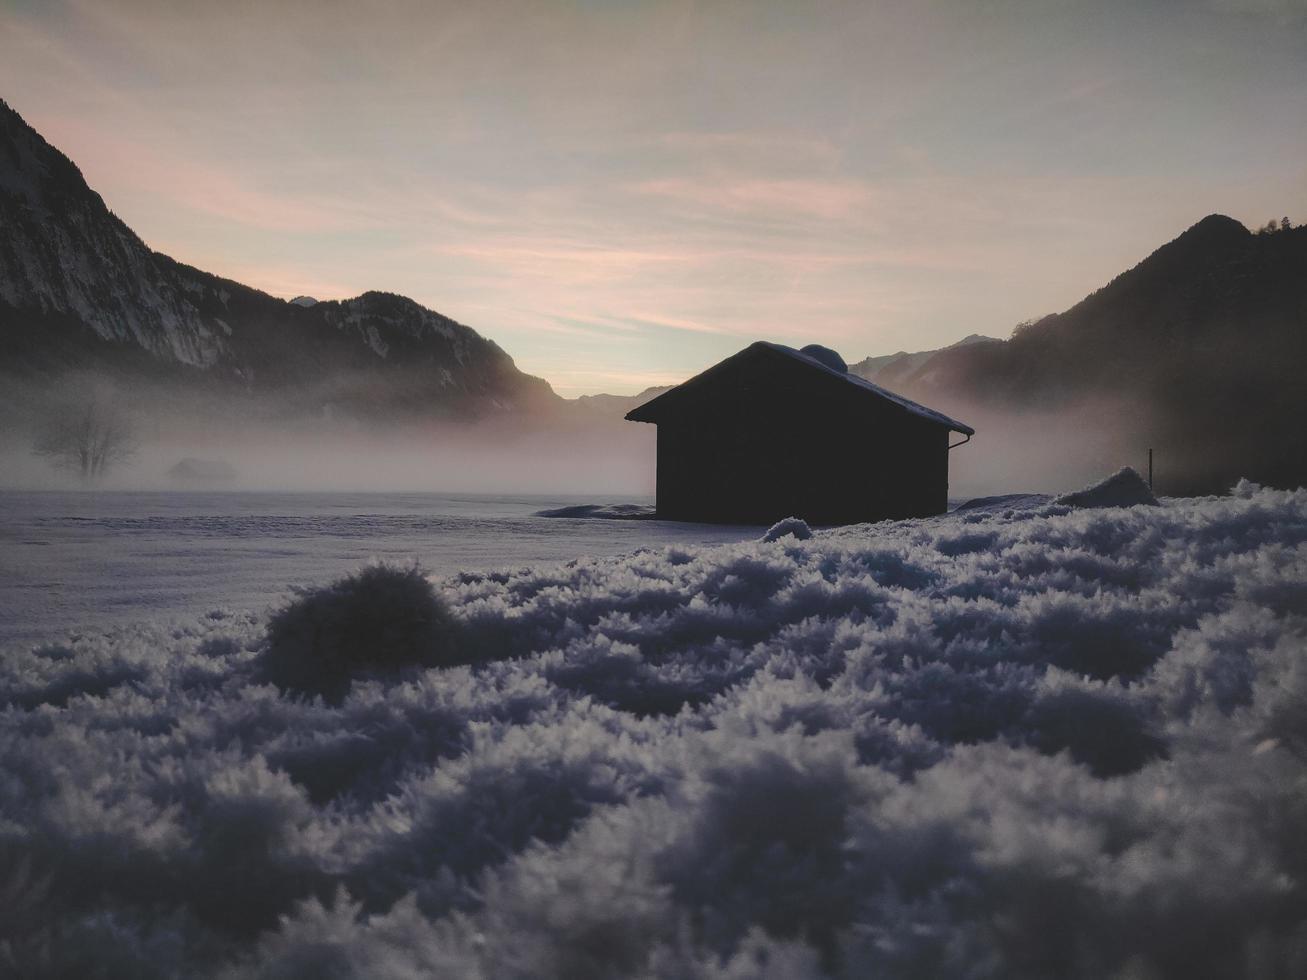 Silhouette of house near mountains photo